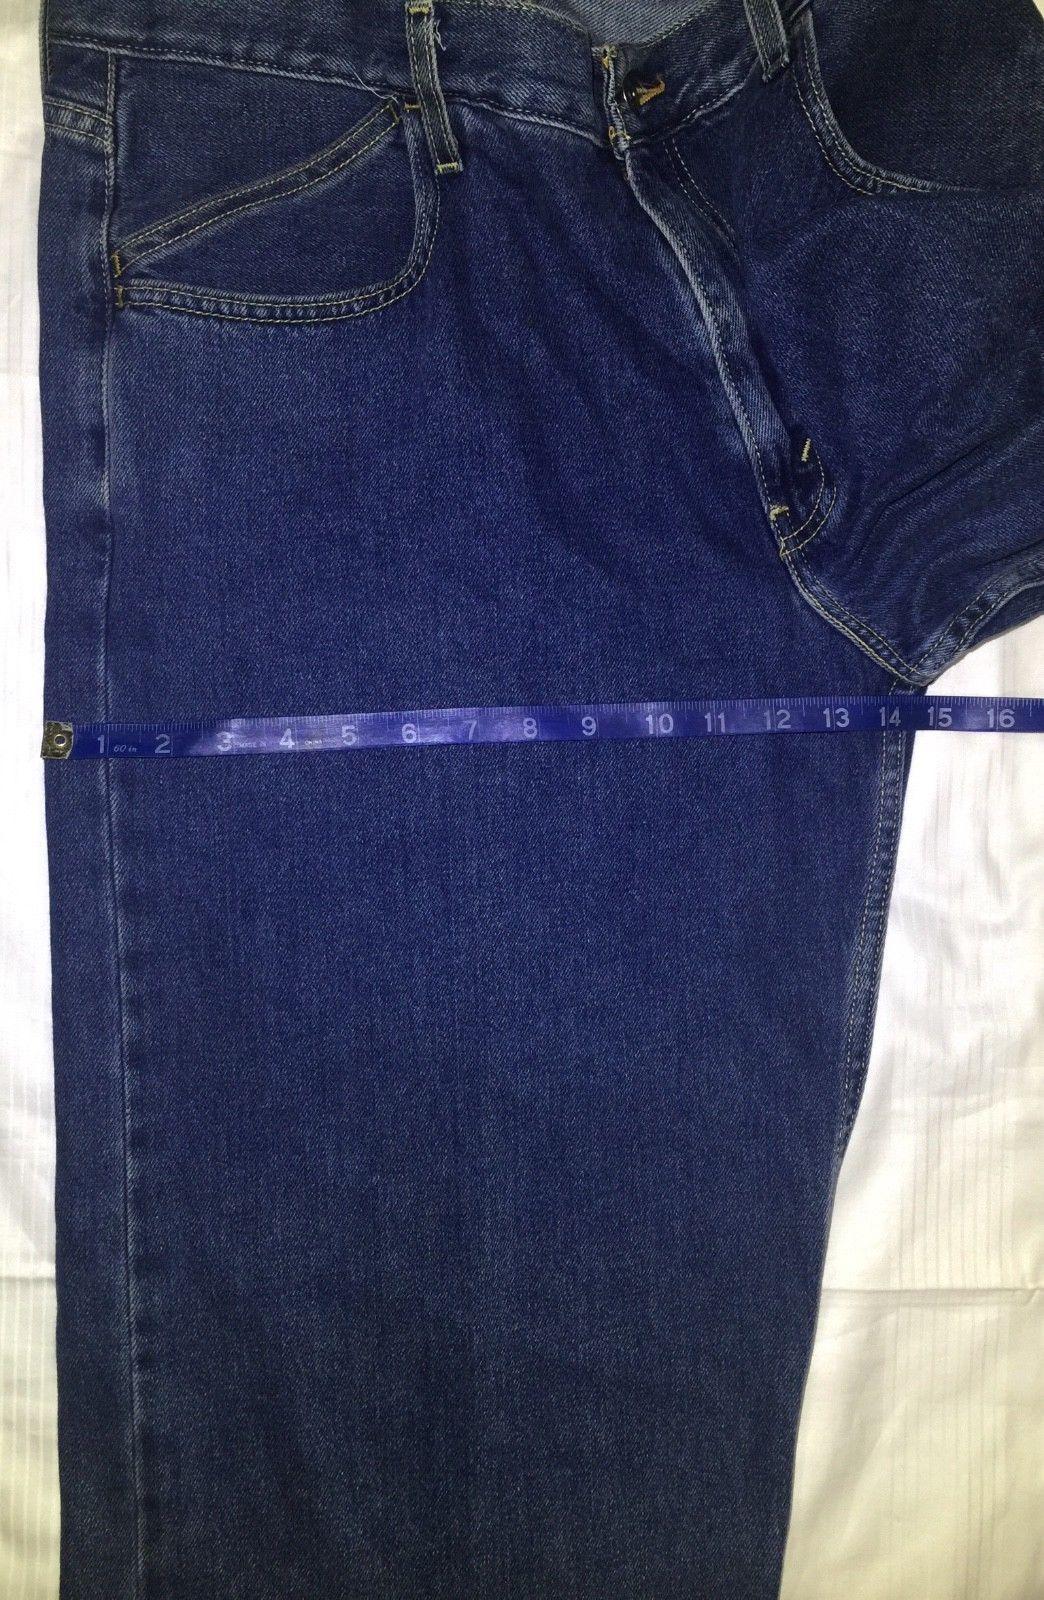 8d1f0e36 Levis SilverTab Baggy Medium Wash Vintage 90s Denim Mens Jeans 34x32 EUC